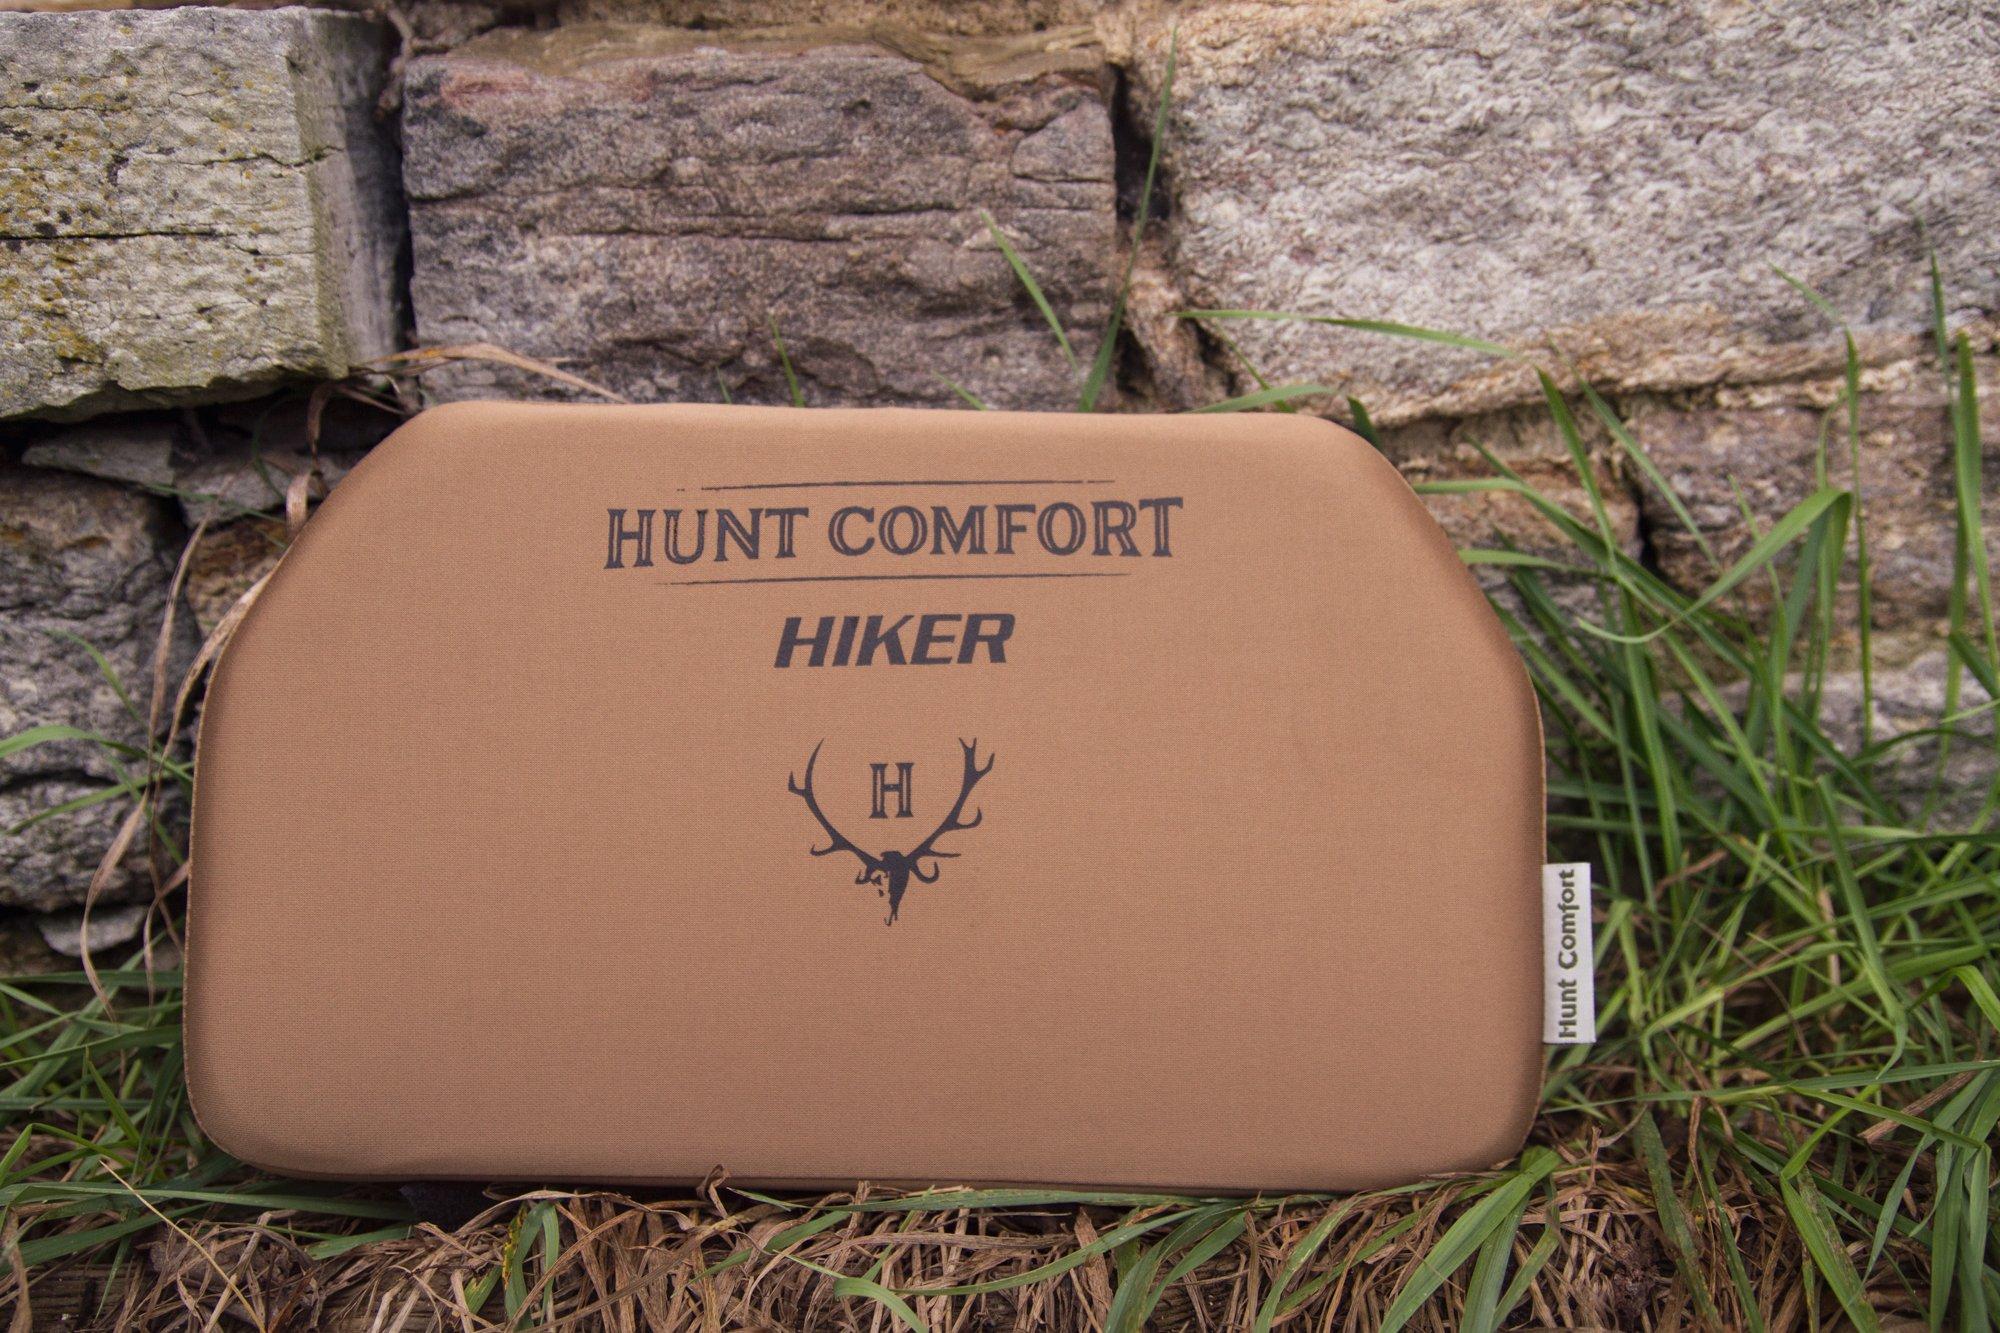 Hunt Comfort Hiker GelCore Hunting Seat, Coyote Brown by Hunt Comfort (Image #8)